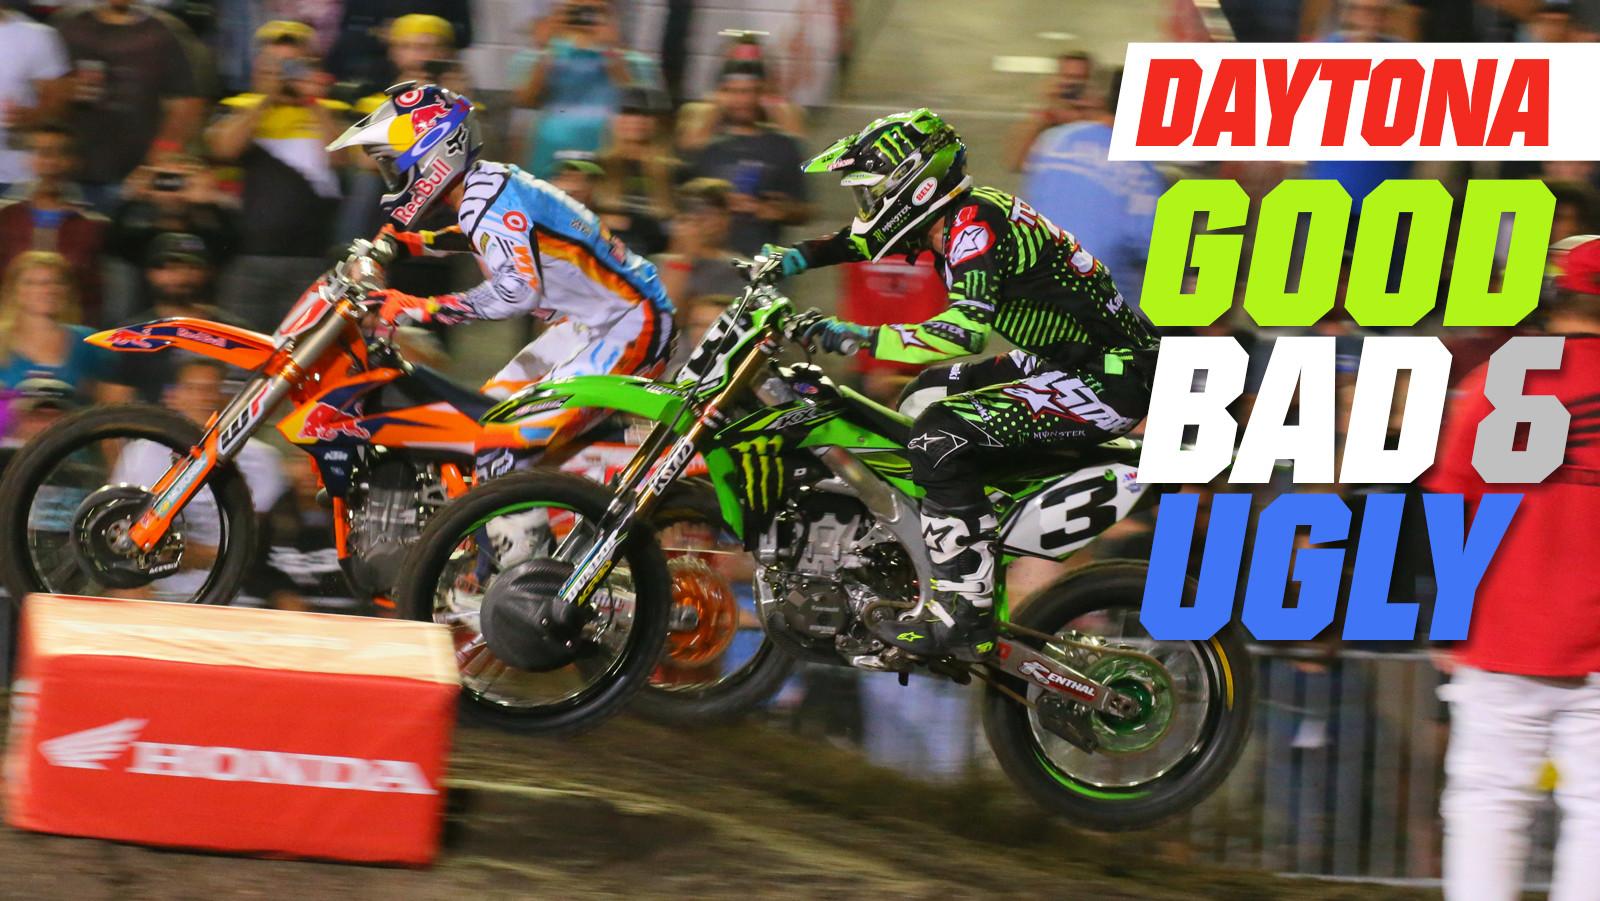 Daytona Supercross - The Good, the Bad, and the Ugly